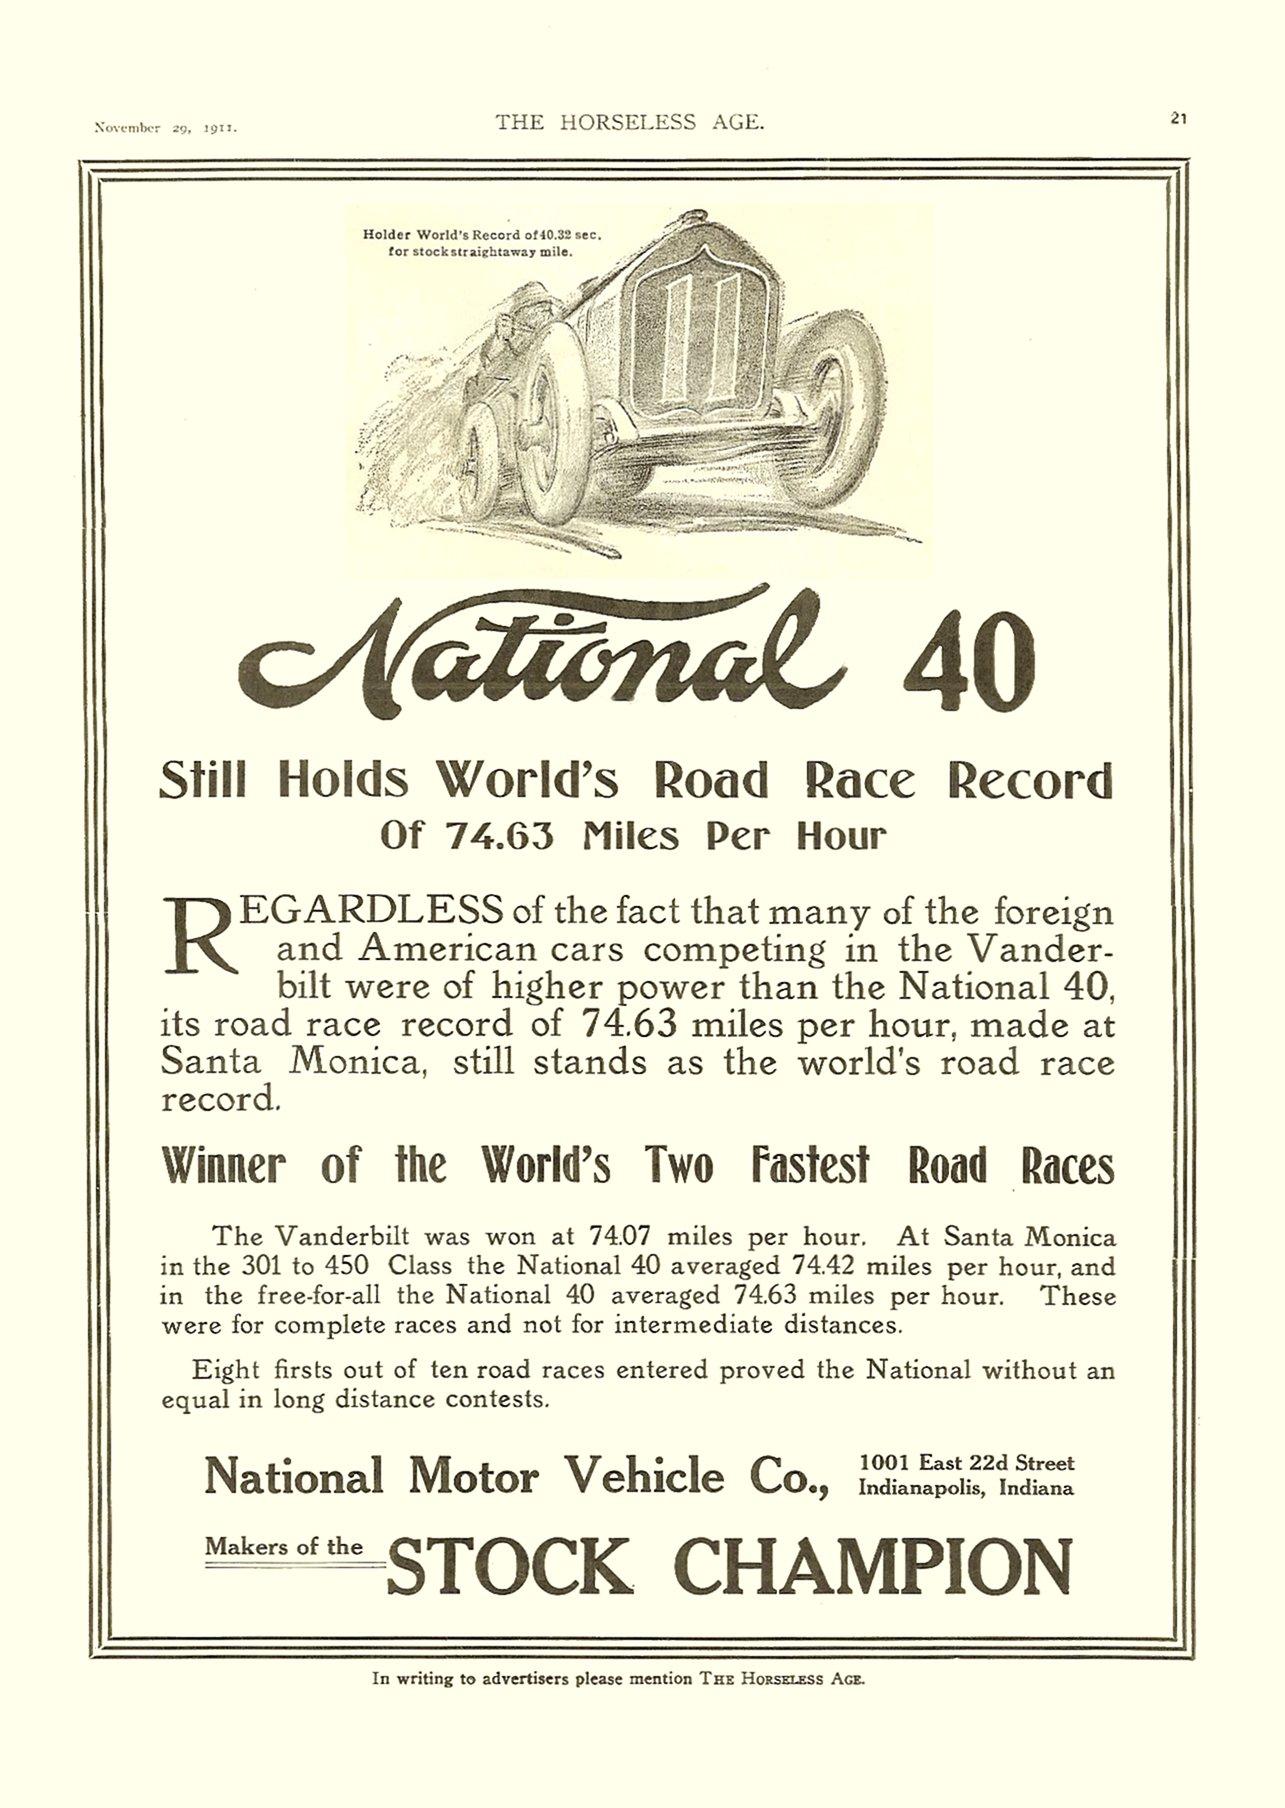 1911 11 29 National 40 STOCK CHAMPION THE HORSELESS AGE November 29, 1911 Vol. 28 No. 22 9″x12″ page 21